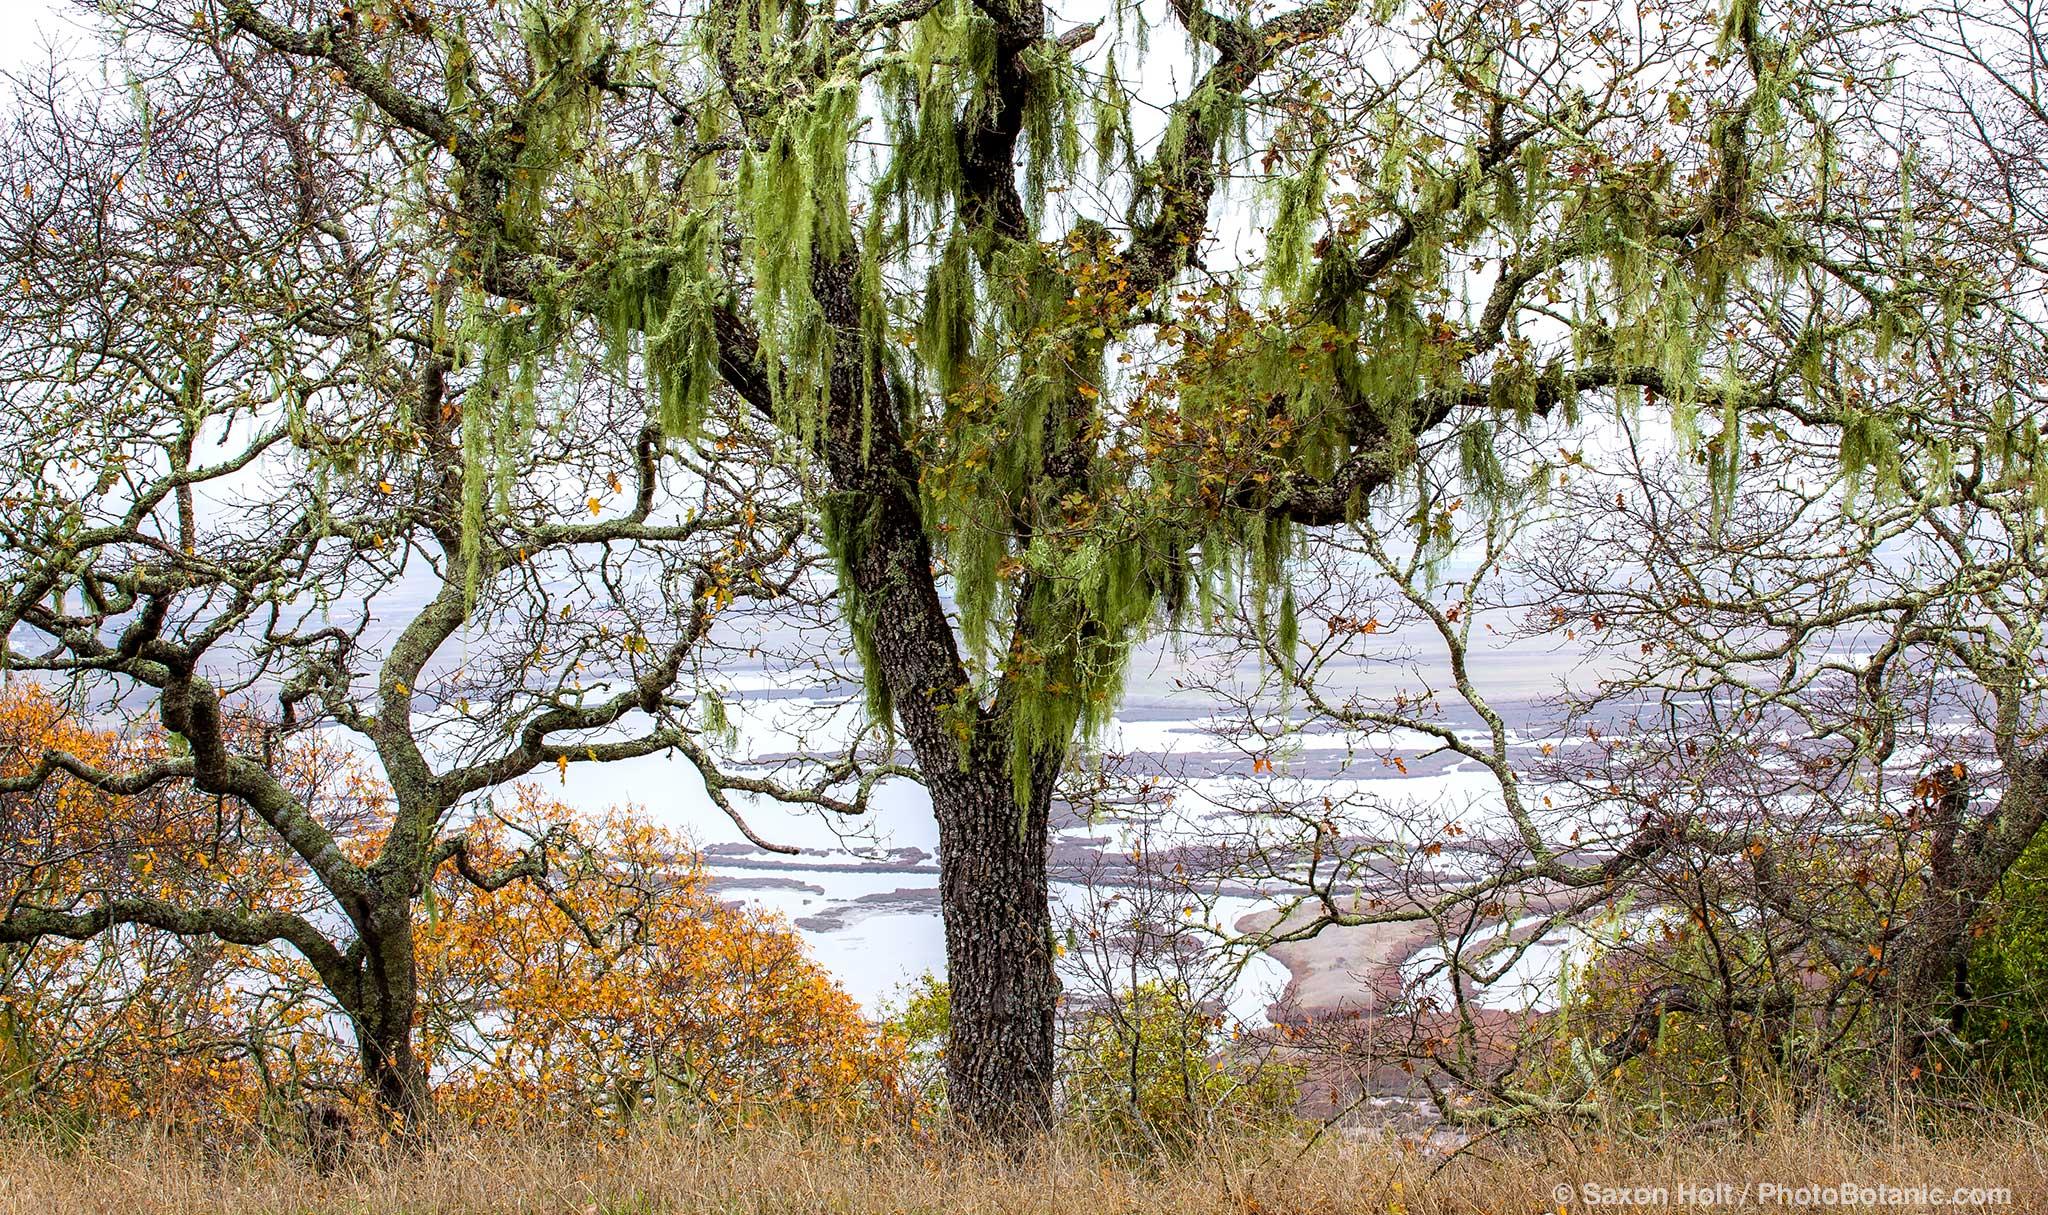 Oak trees with Lace lichen, or Ramalina menziesii in autumn , Rush Creek Open Space, Marin County overlooking Petaluma Marsh